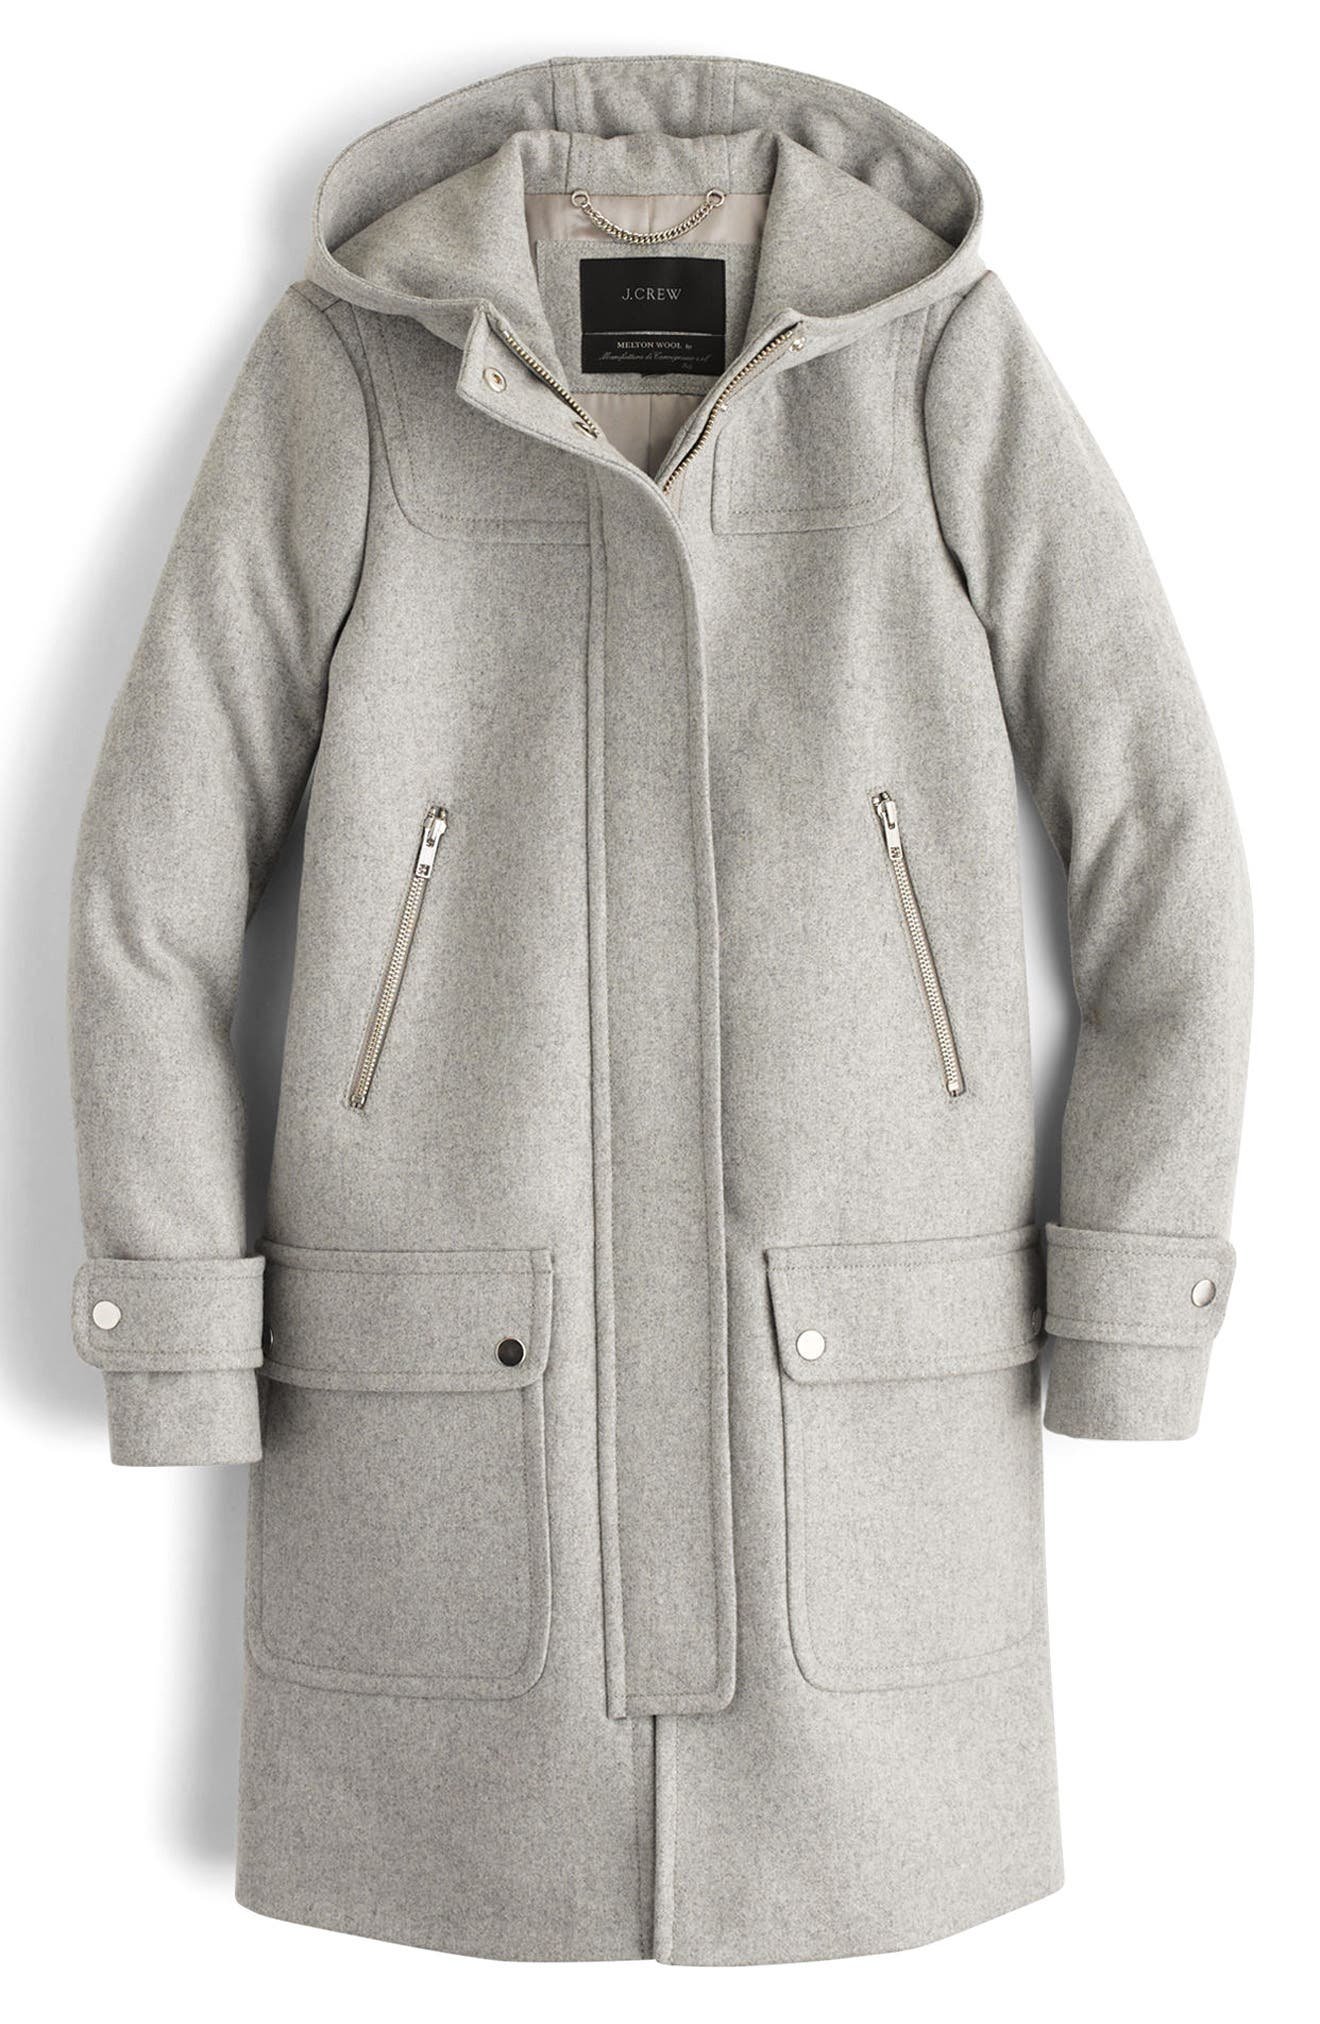 Alternate Image 1 Selected - J.Crew Wool Melton Duffle Coat